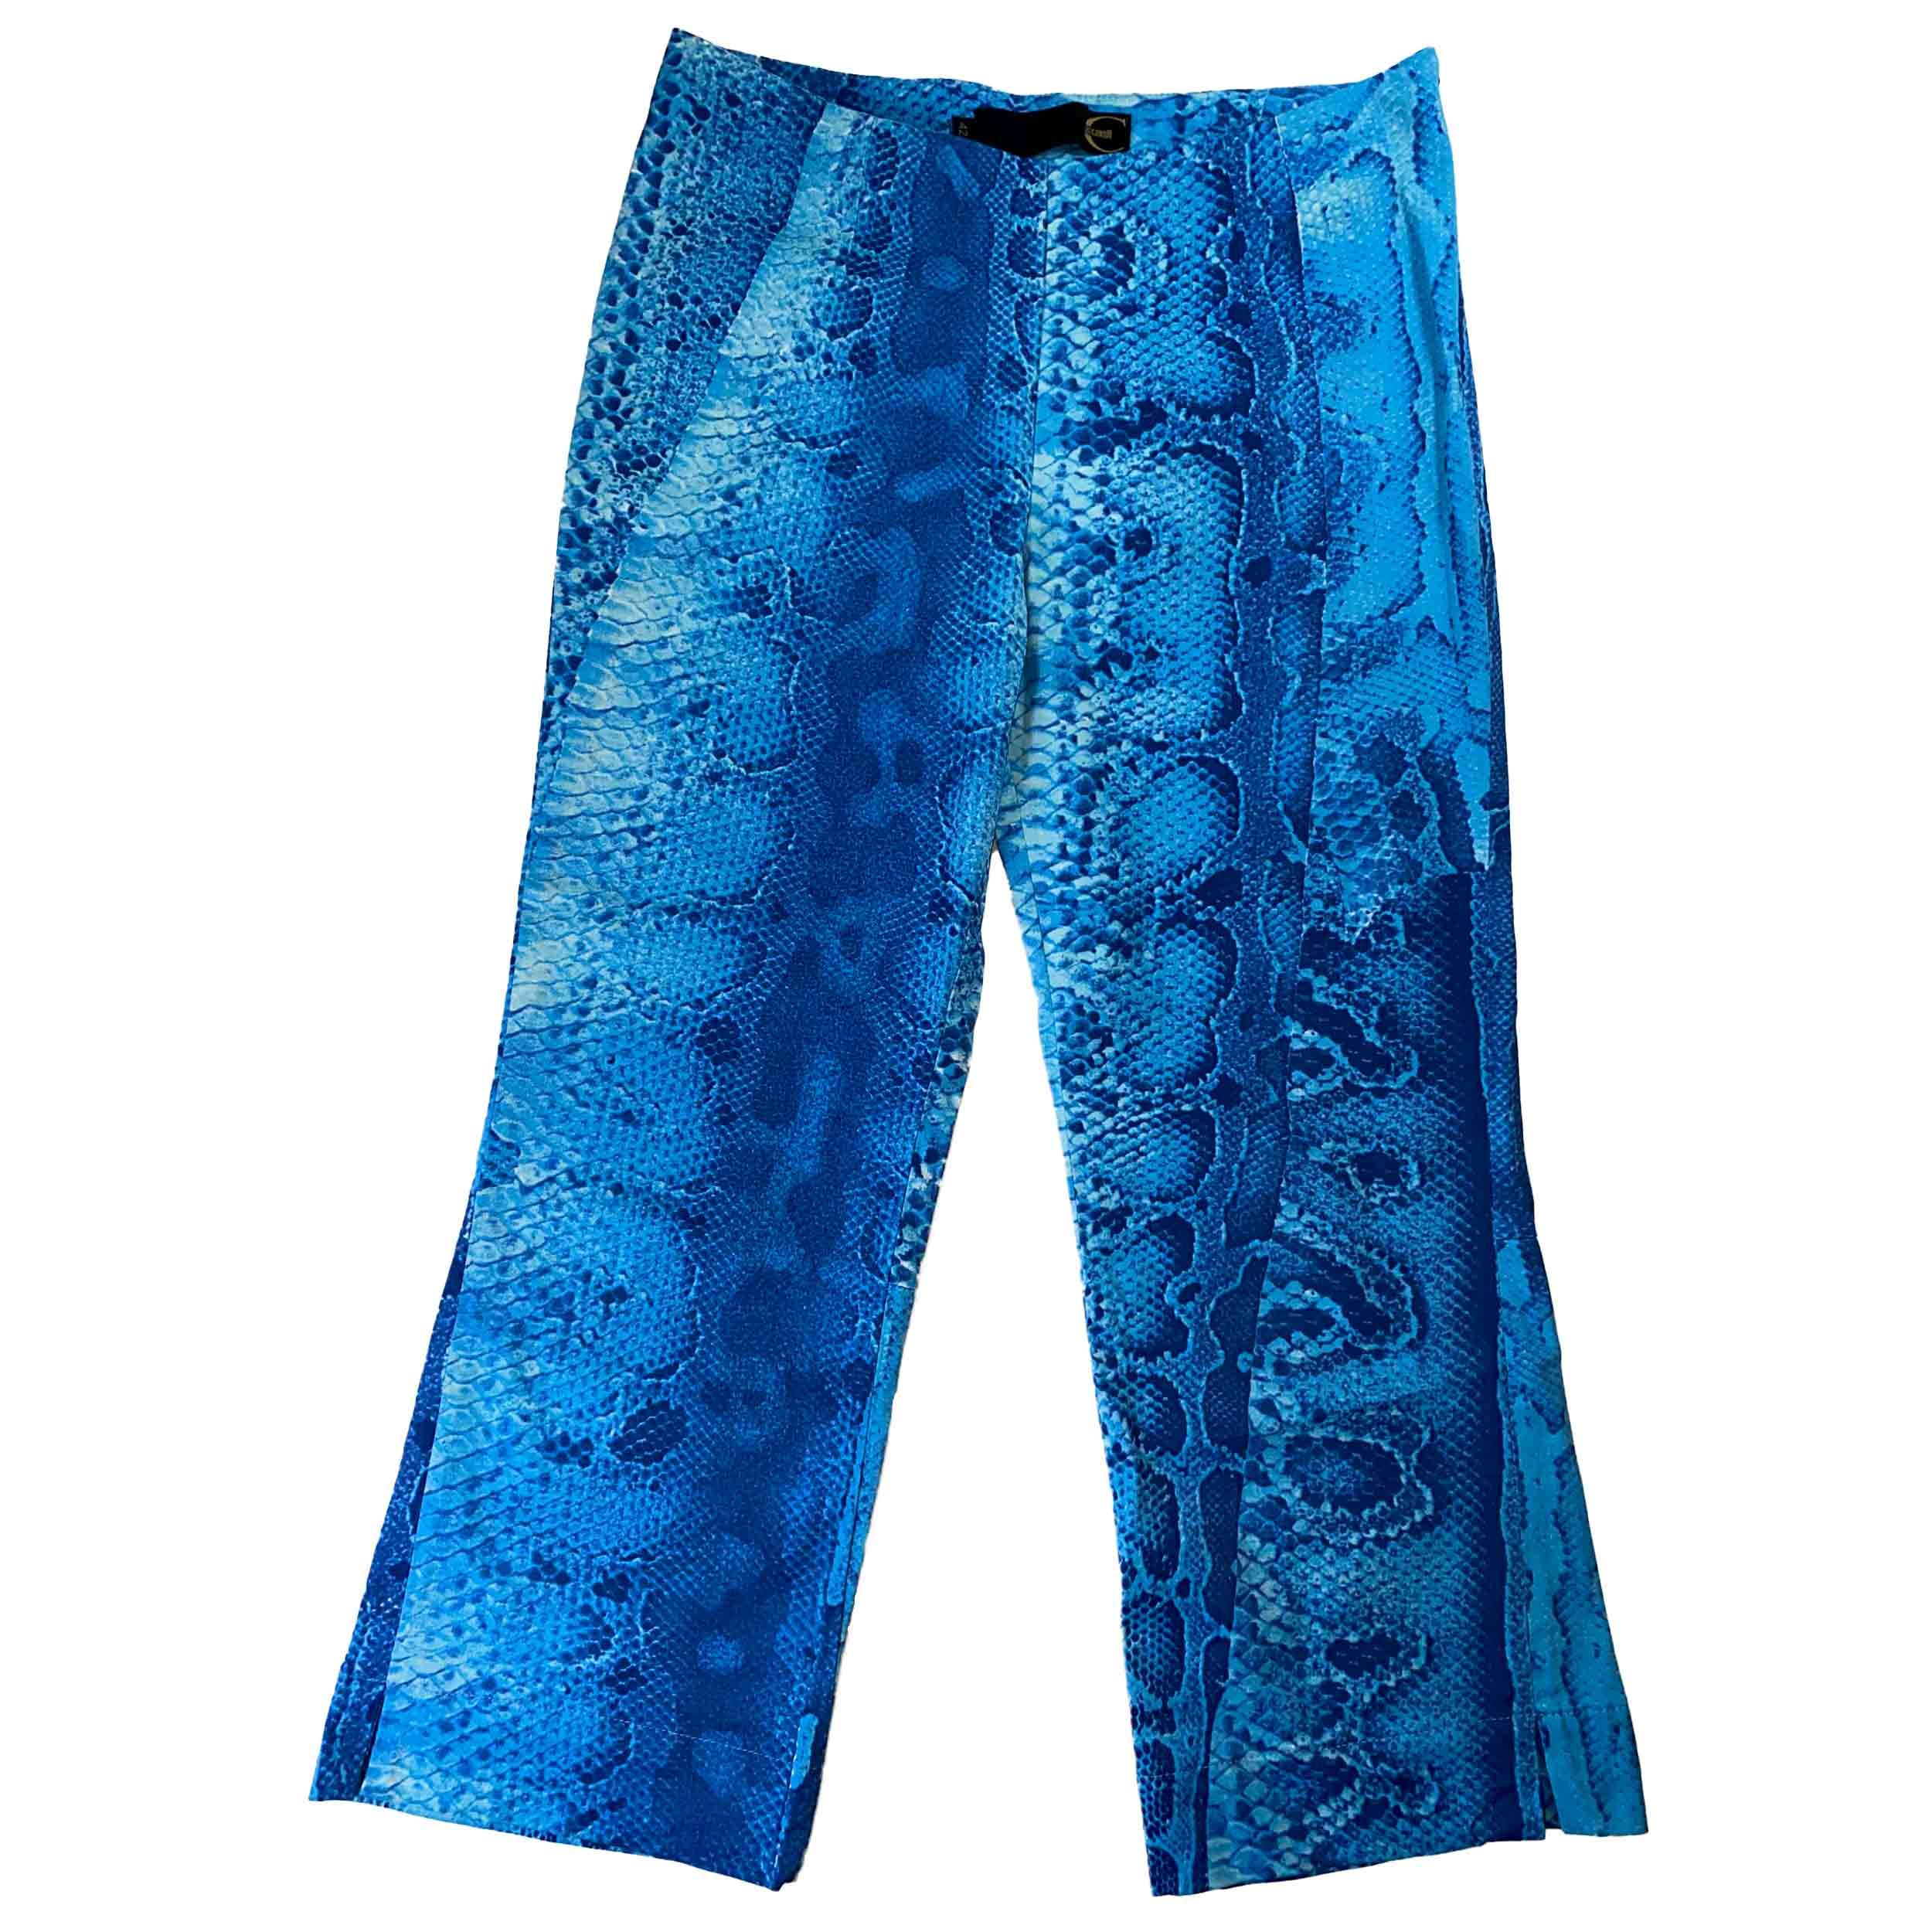 Vintage Roberto Cavalli Capri Snakeskin Pants